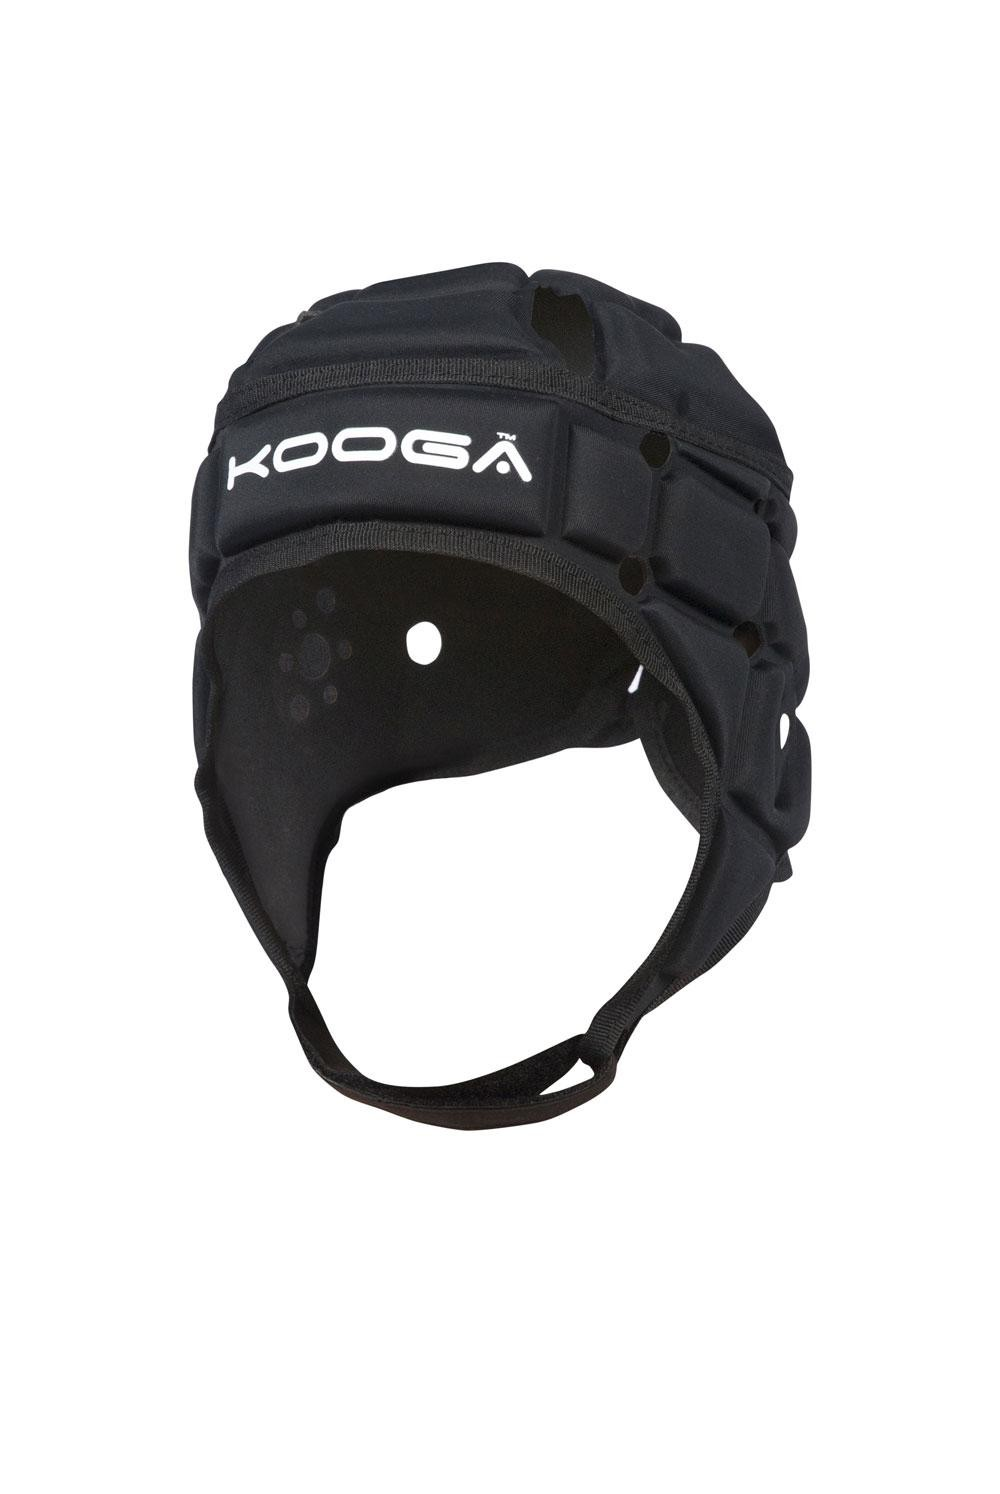 Kooga Combat Junior Headguard Black